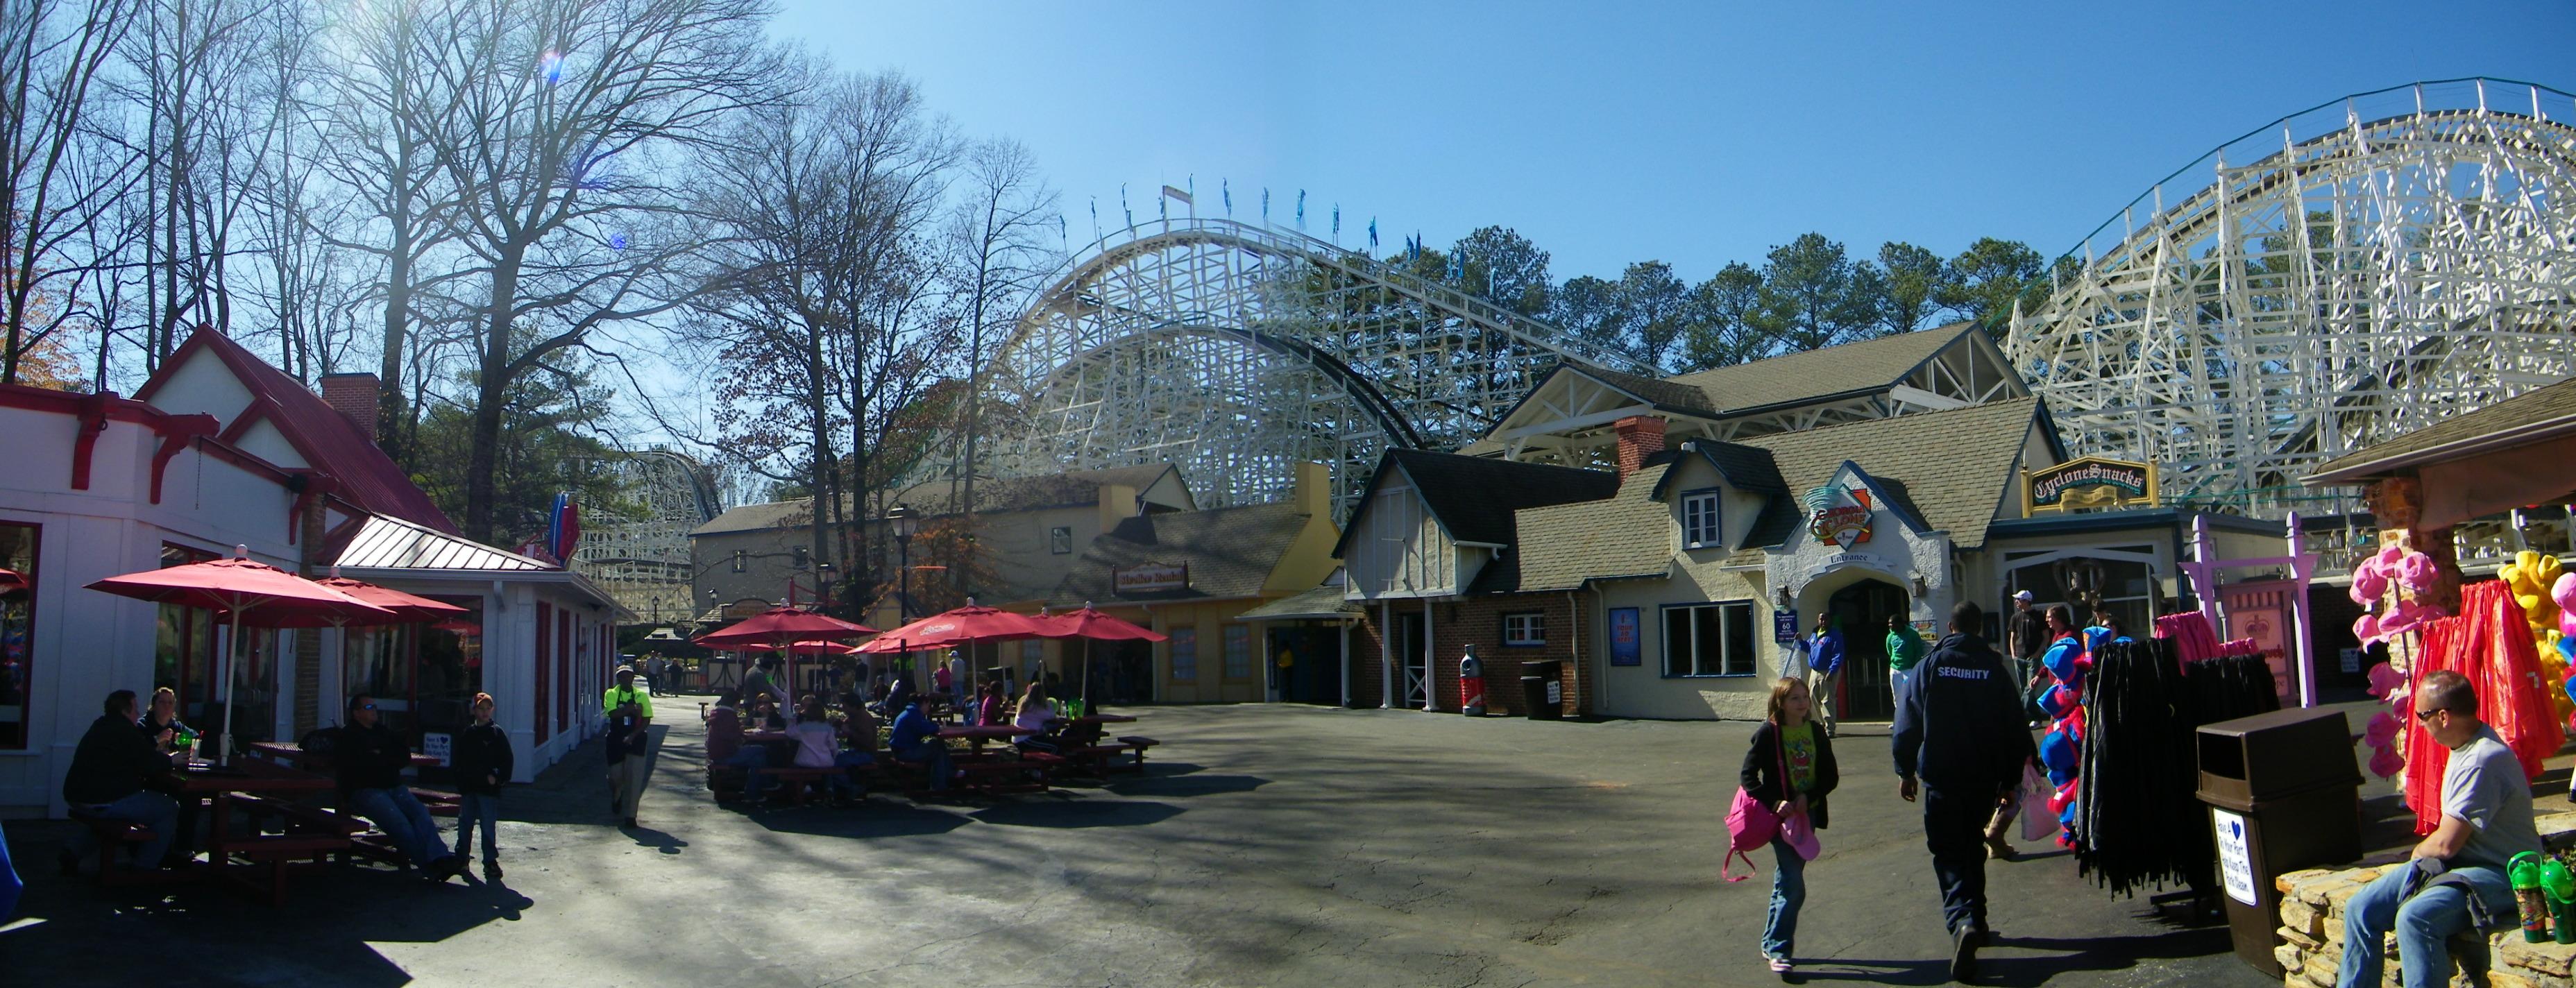 Six Flags over Georgia 2010